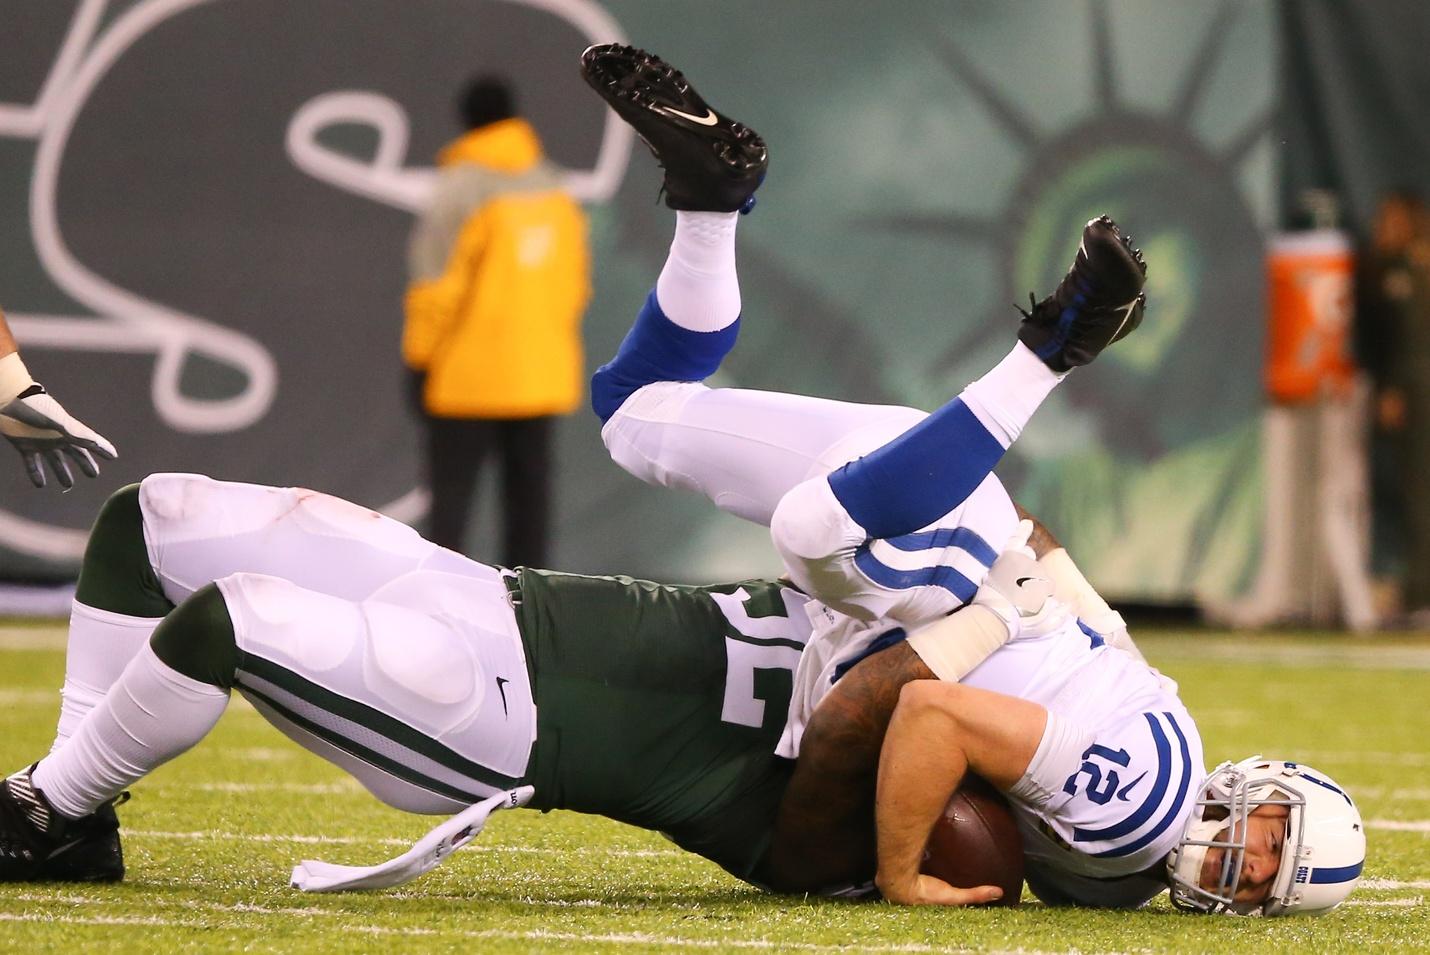 New York Jets defensive end Leonard Williams sacks Indianapolis Colts quarterback Andrew Luck